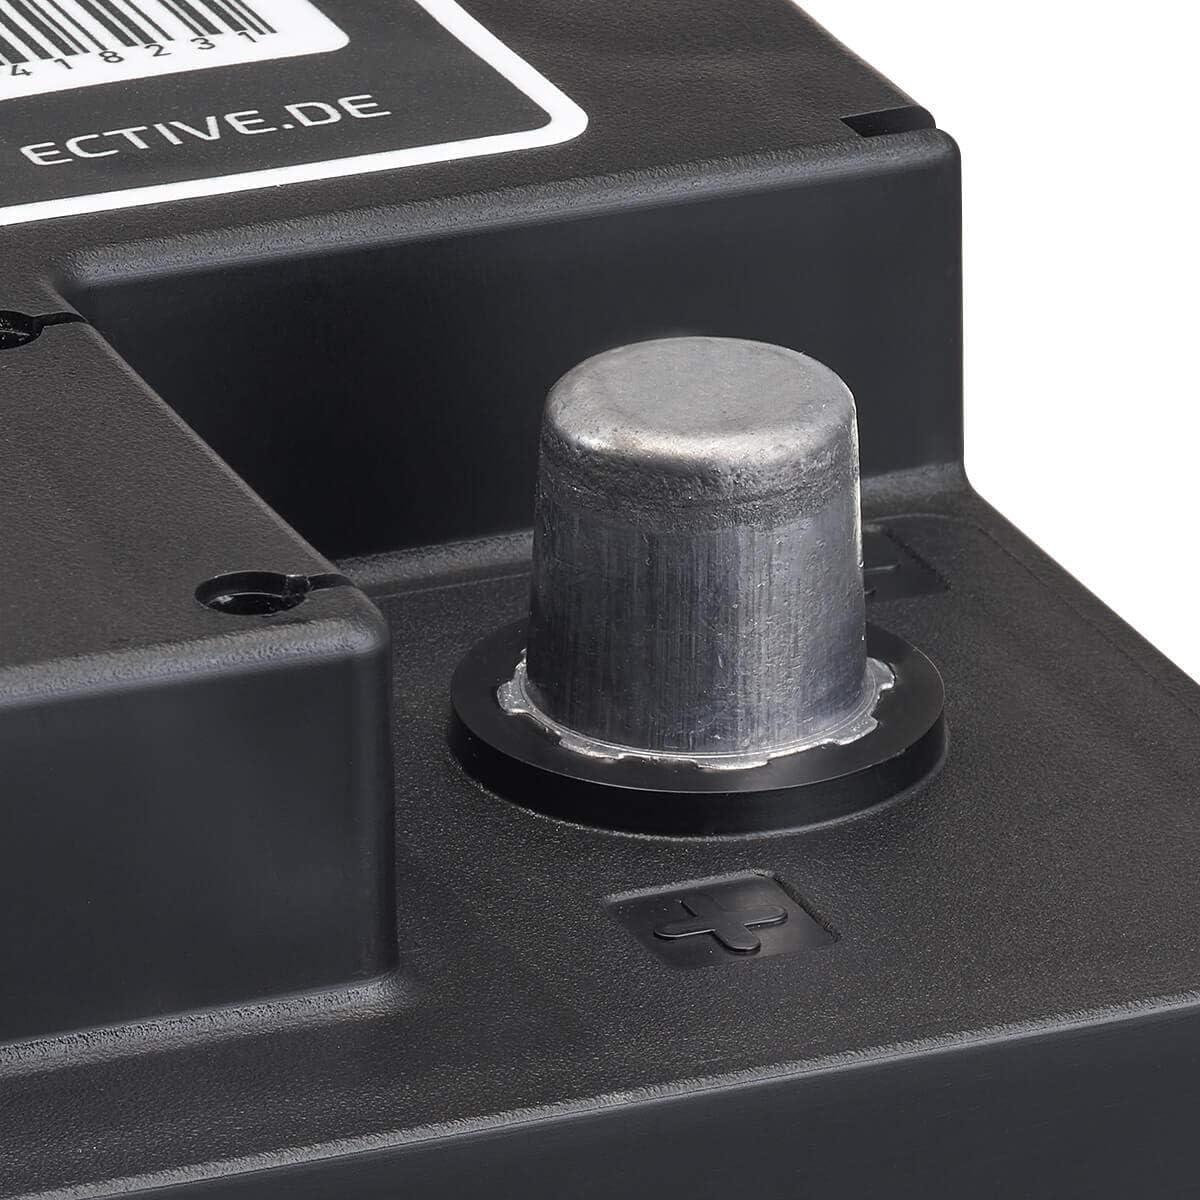 ECTIVE 12V 110Ah zyklenfester AGM Blei-Akku Versorgungsbatterie VRLA Starterbatterie Semi Cycle SC110 wartungsfrei